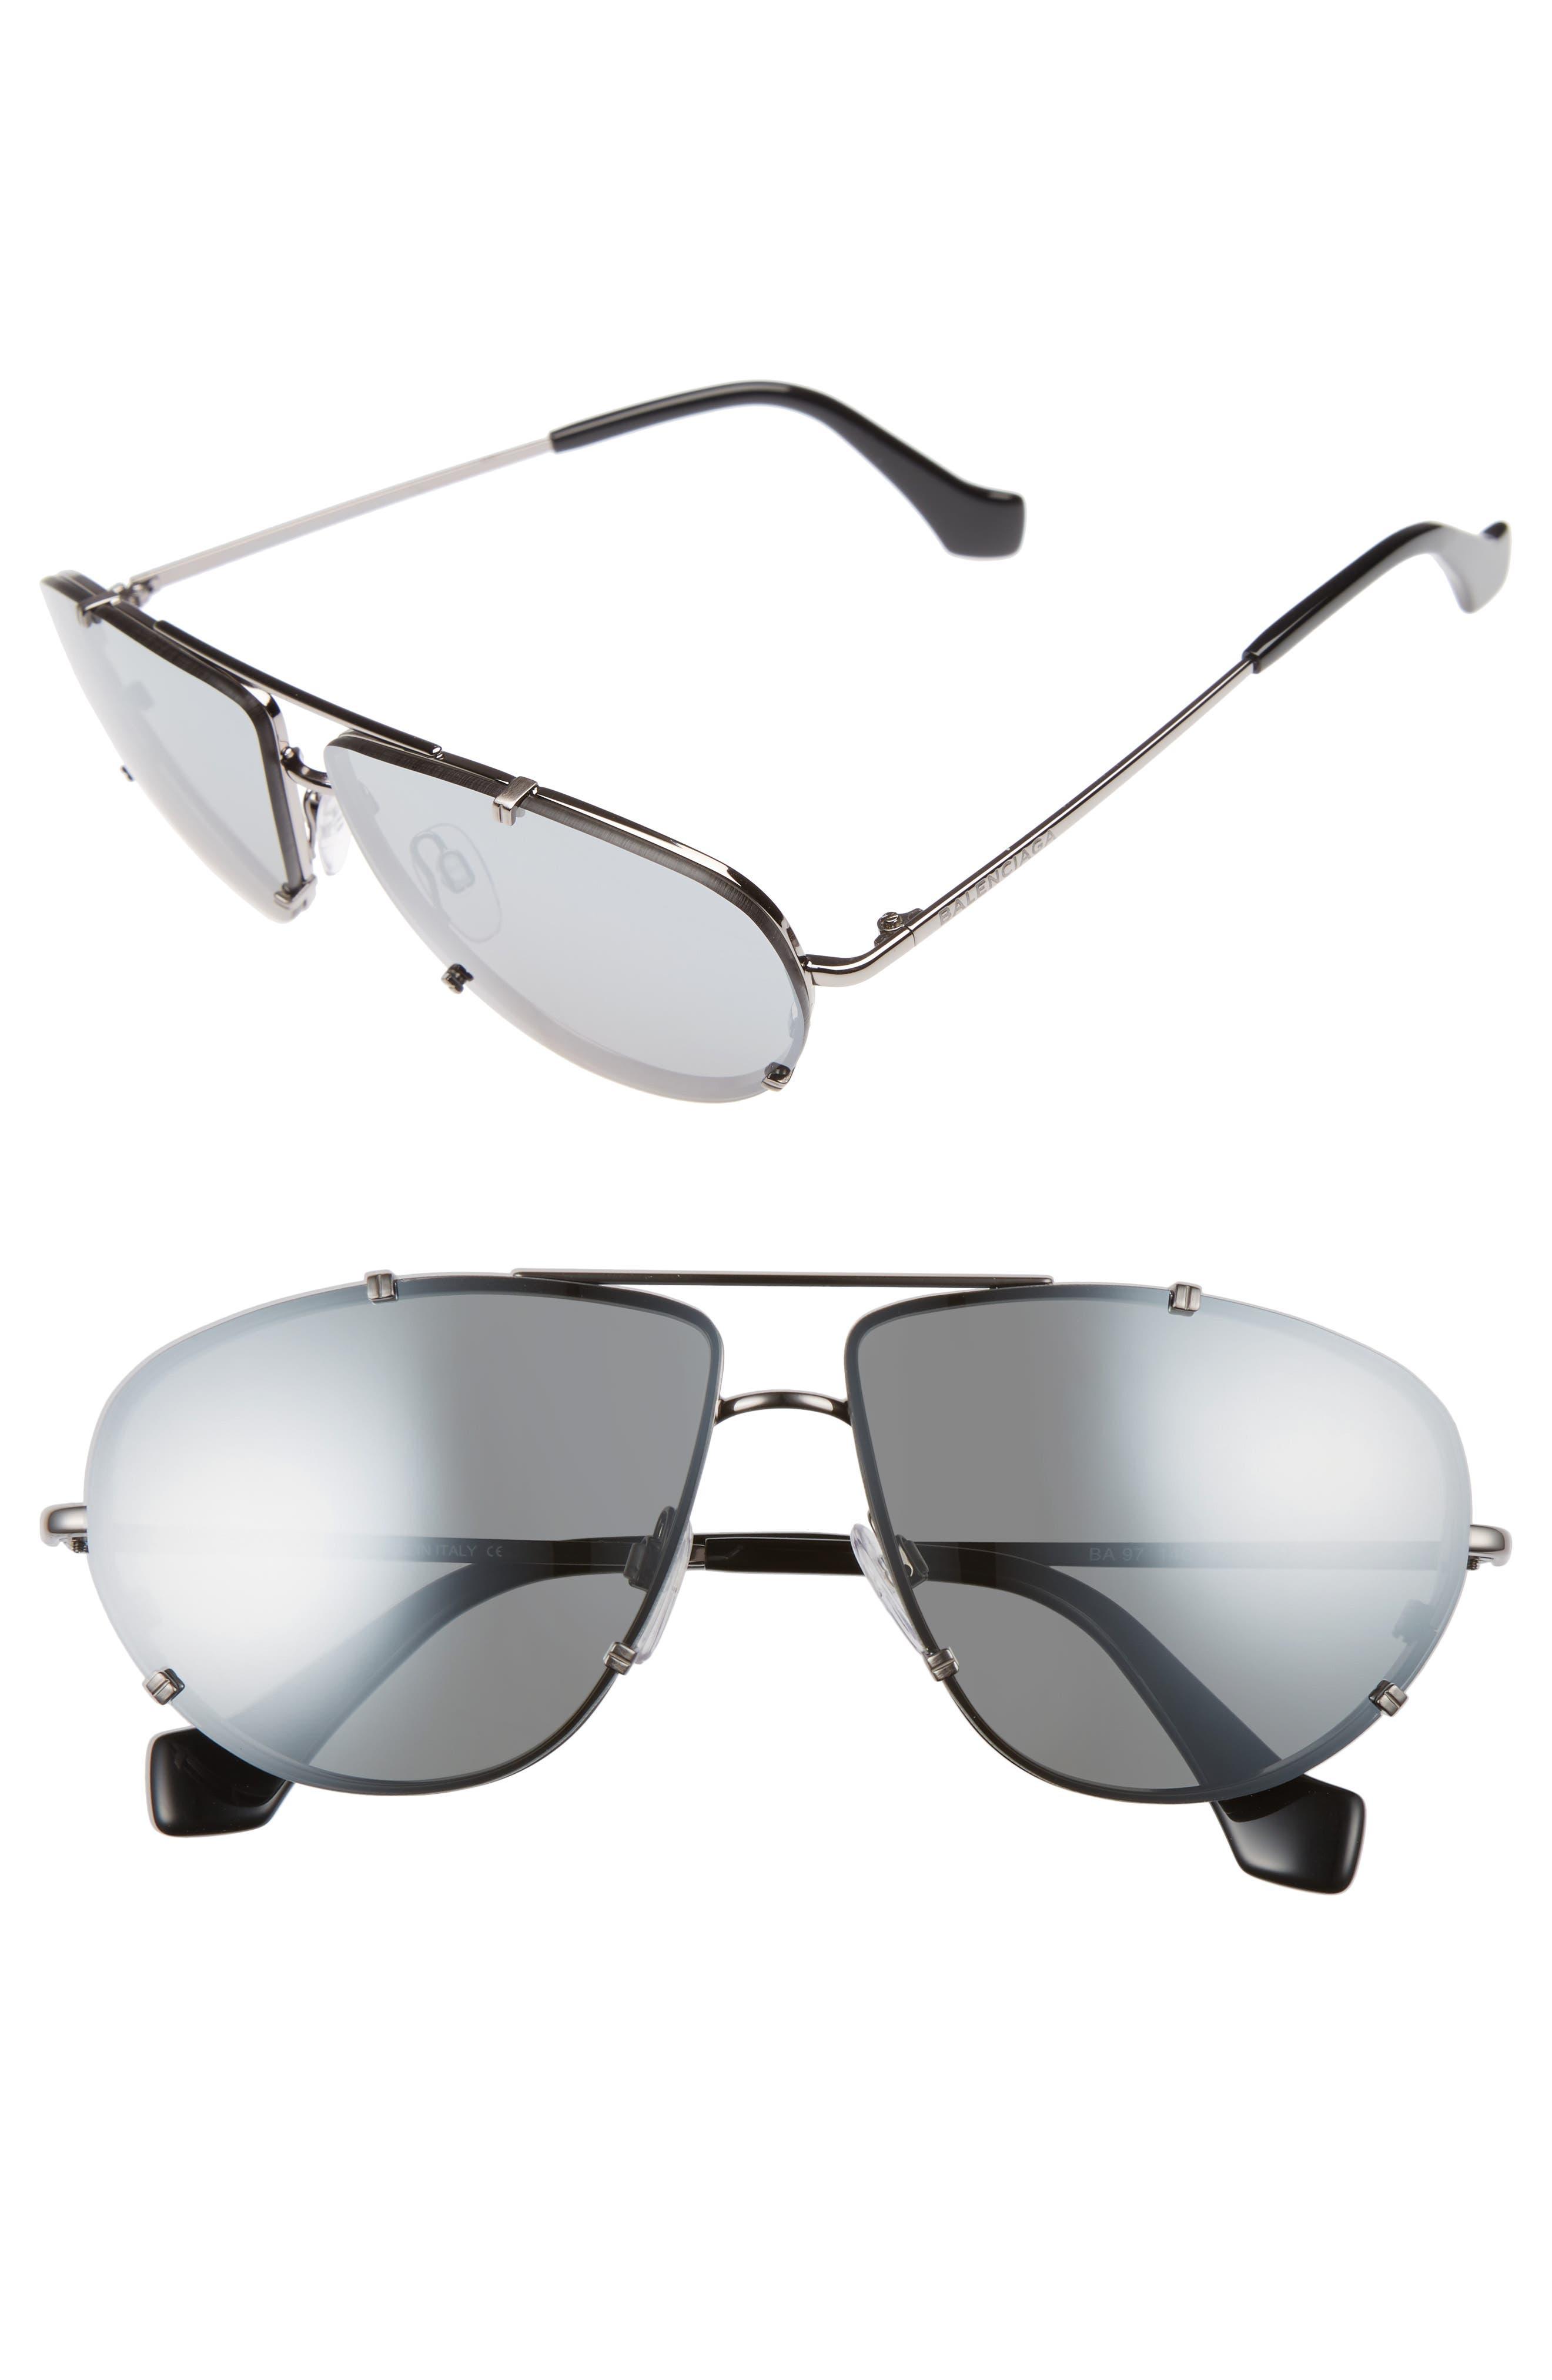 62mm Aviator Sunglasses,                         Main,                         color, 040